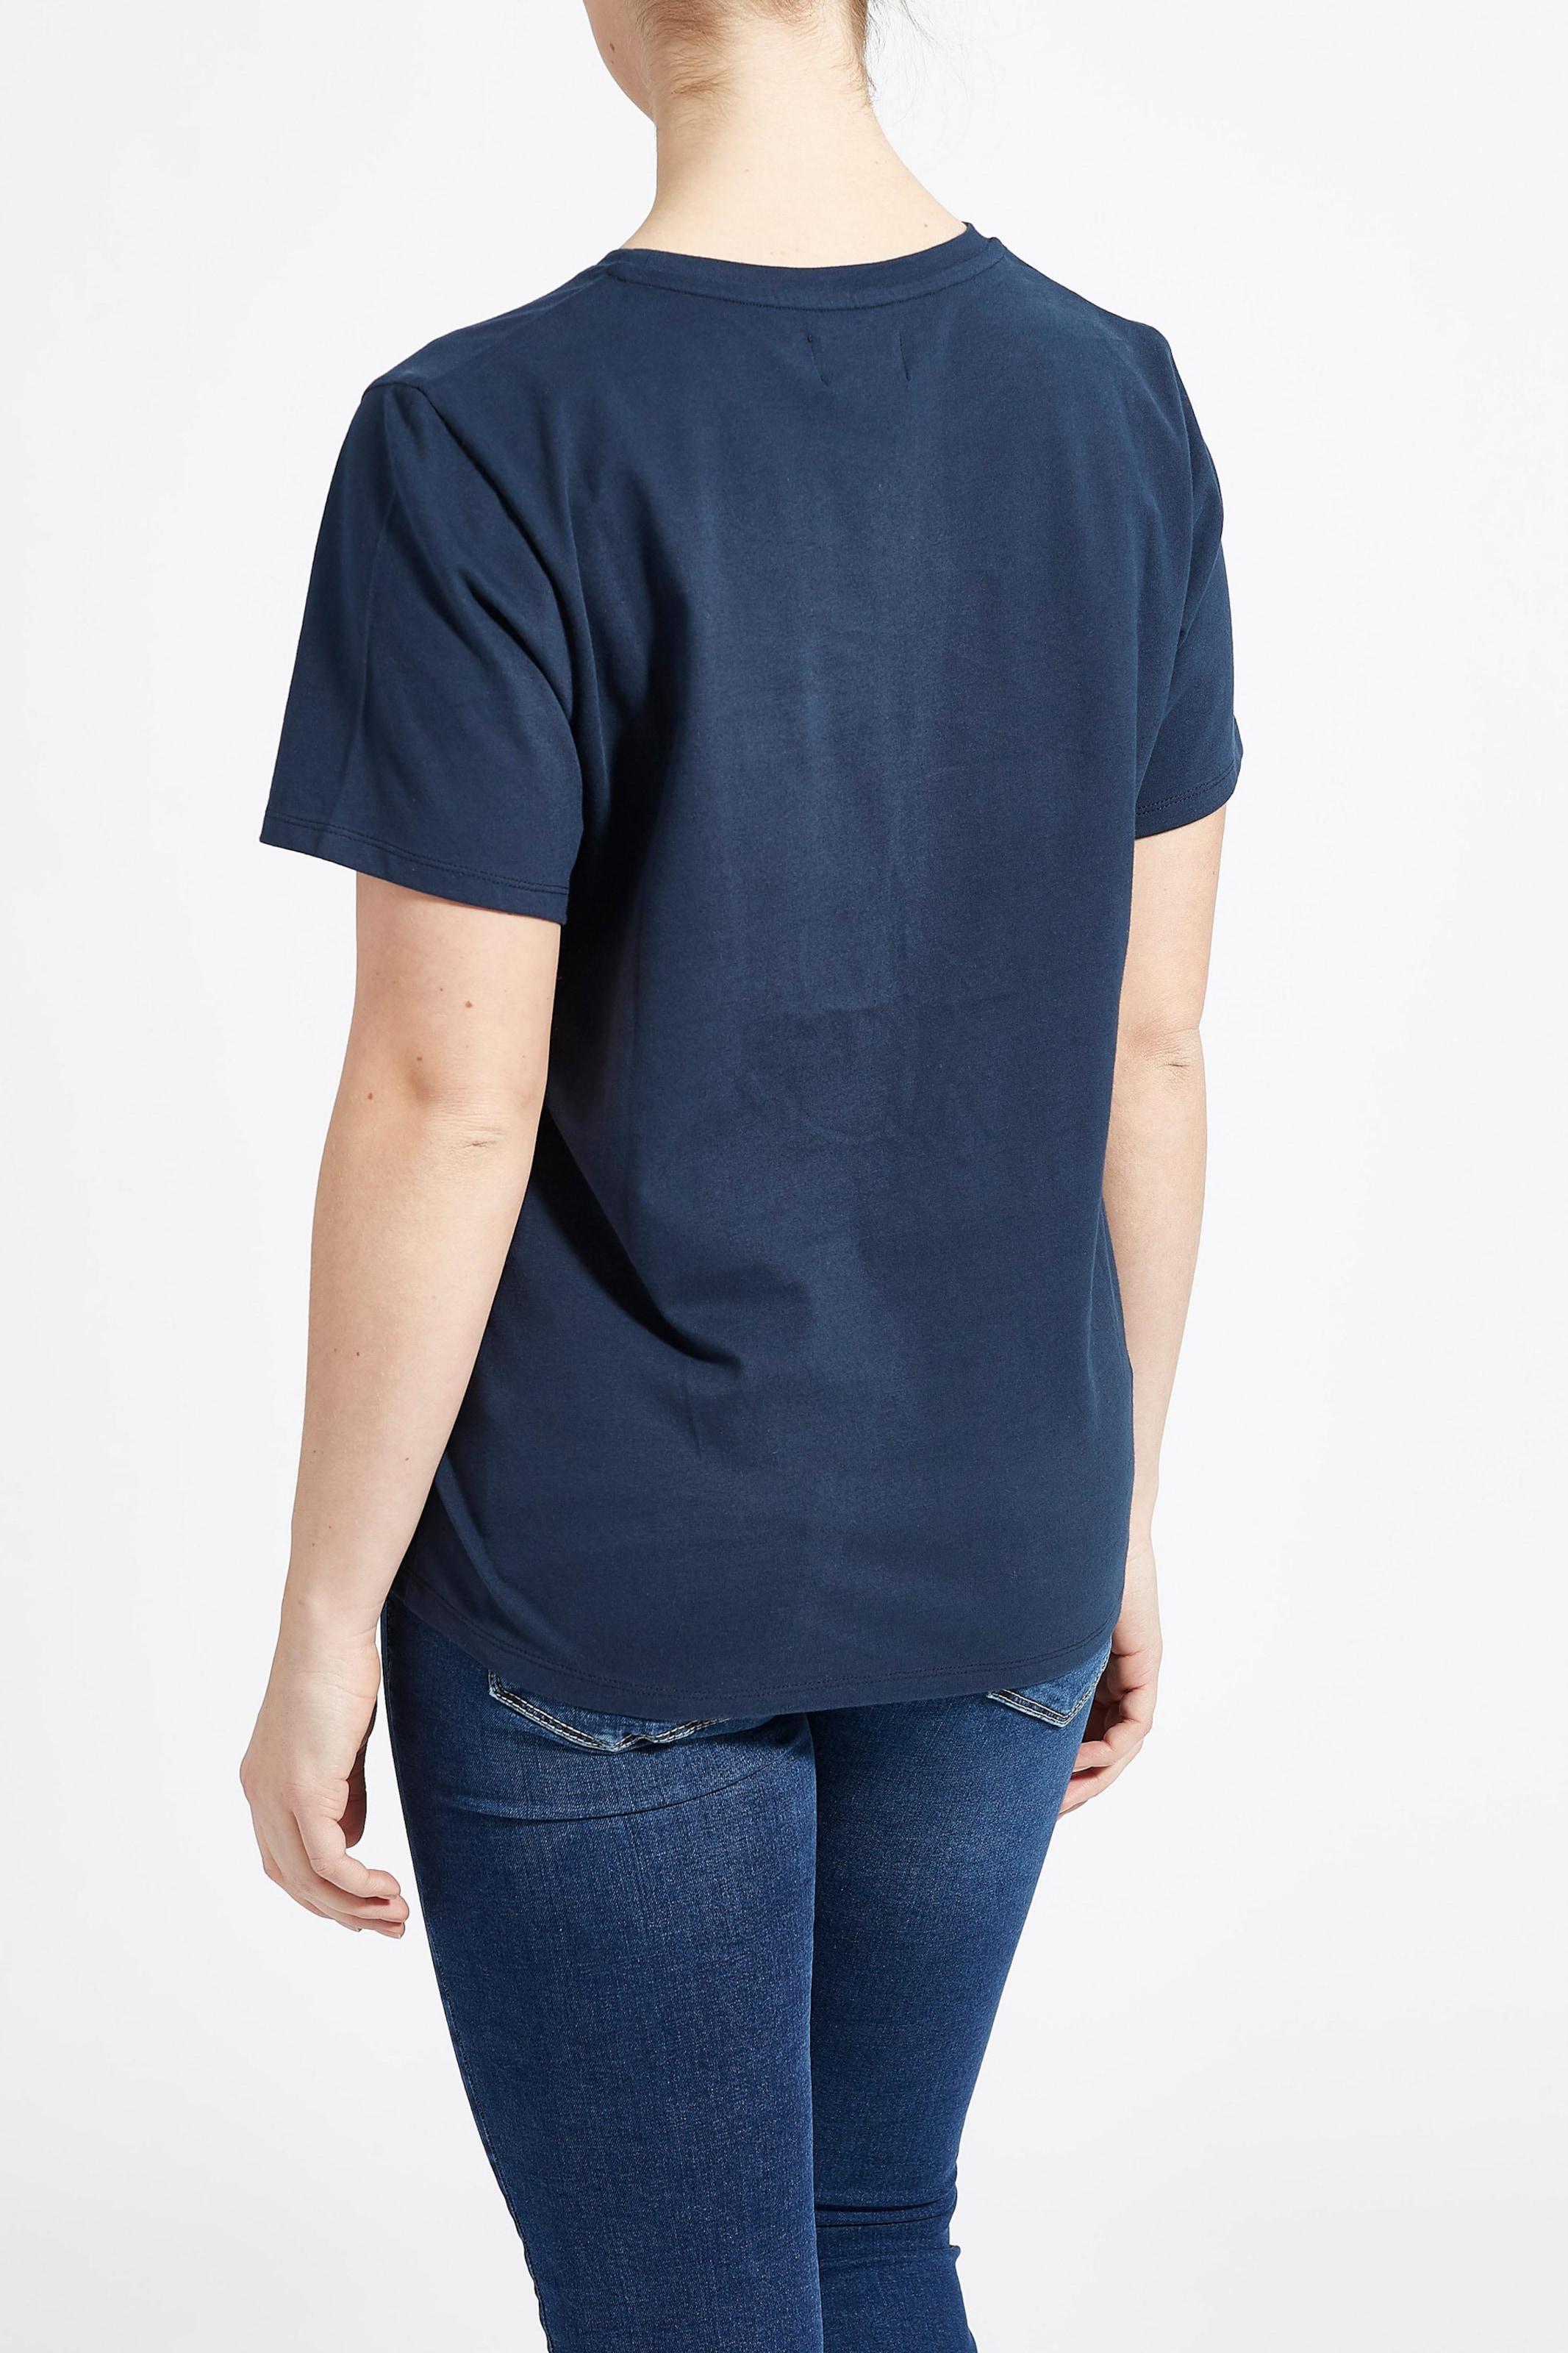 In T 'lovely Heart' Laurie shirt Navy ED2H9I